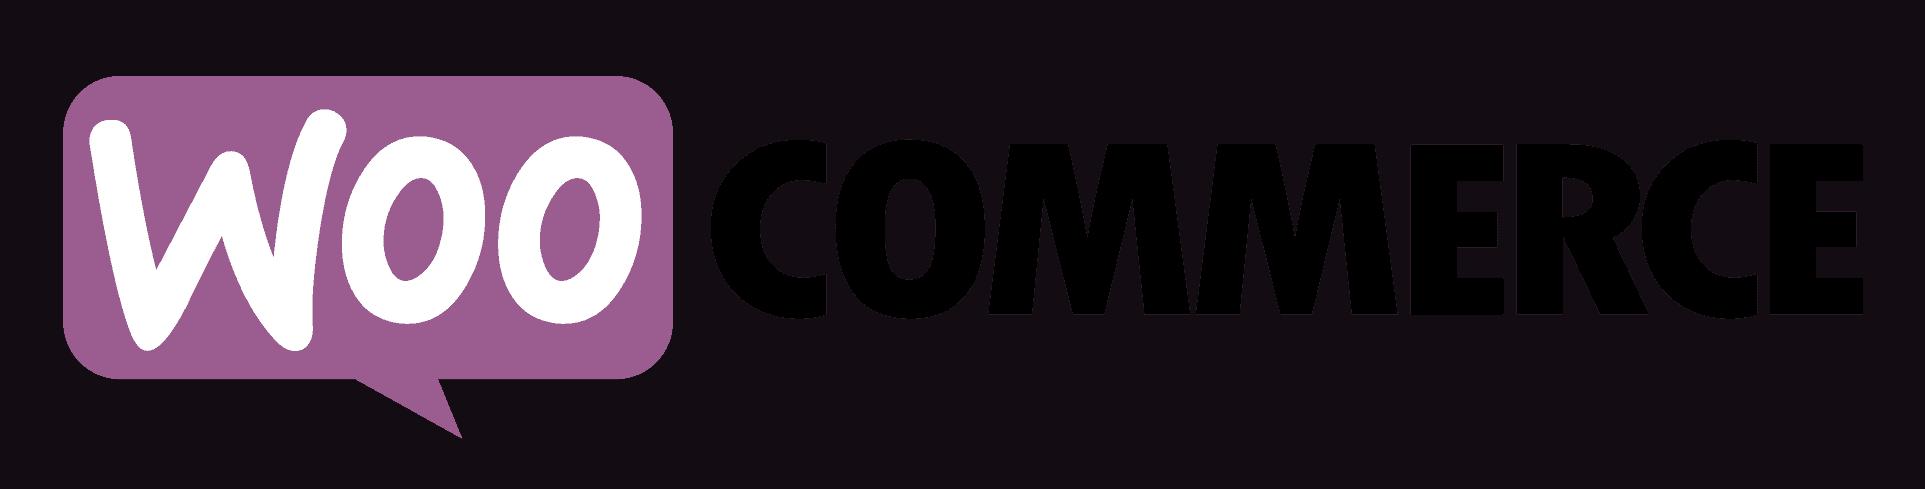 Woocommerce logo transparent